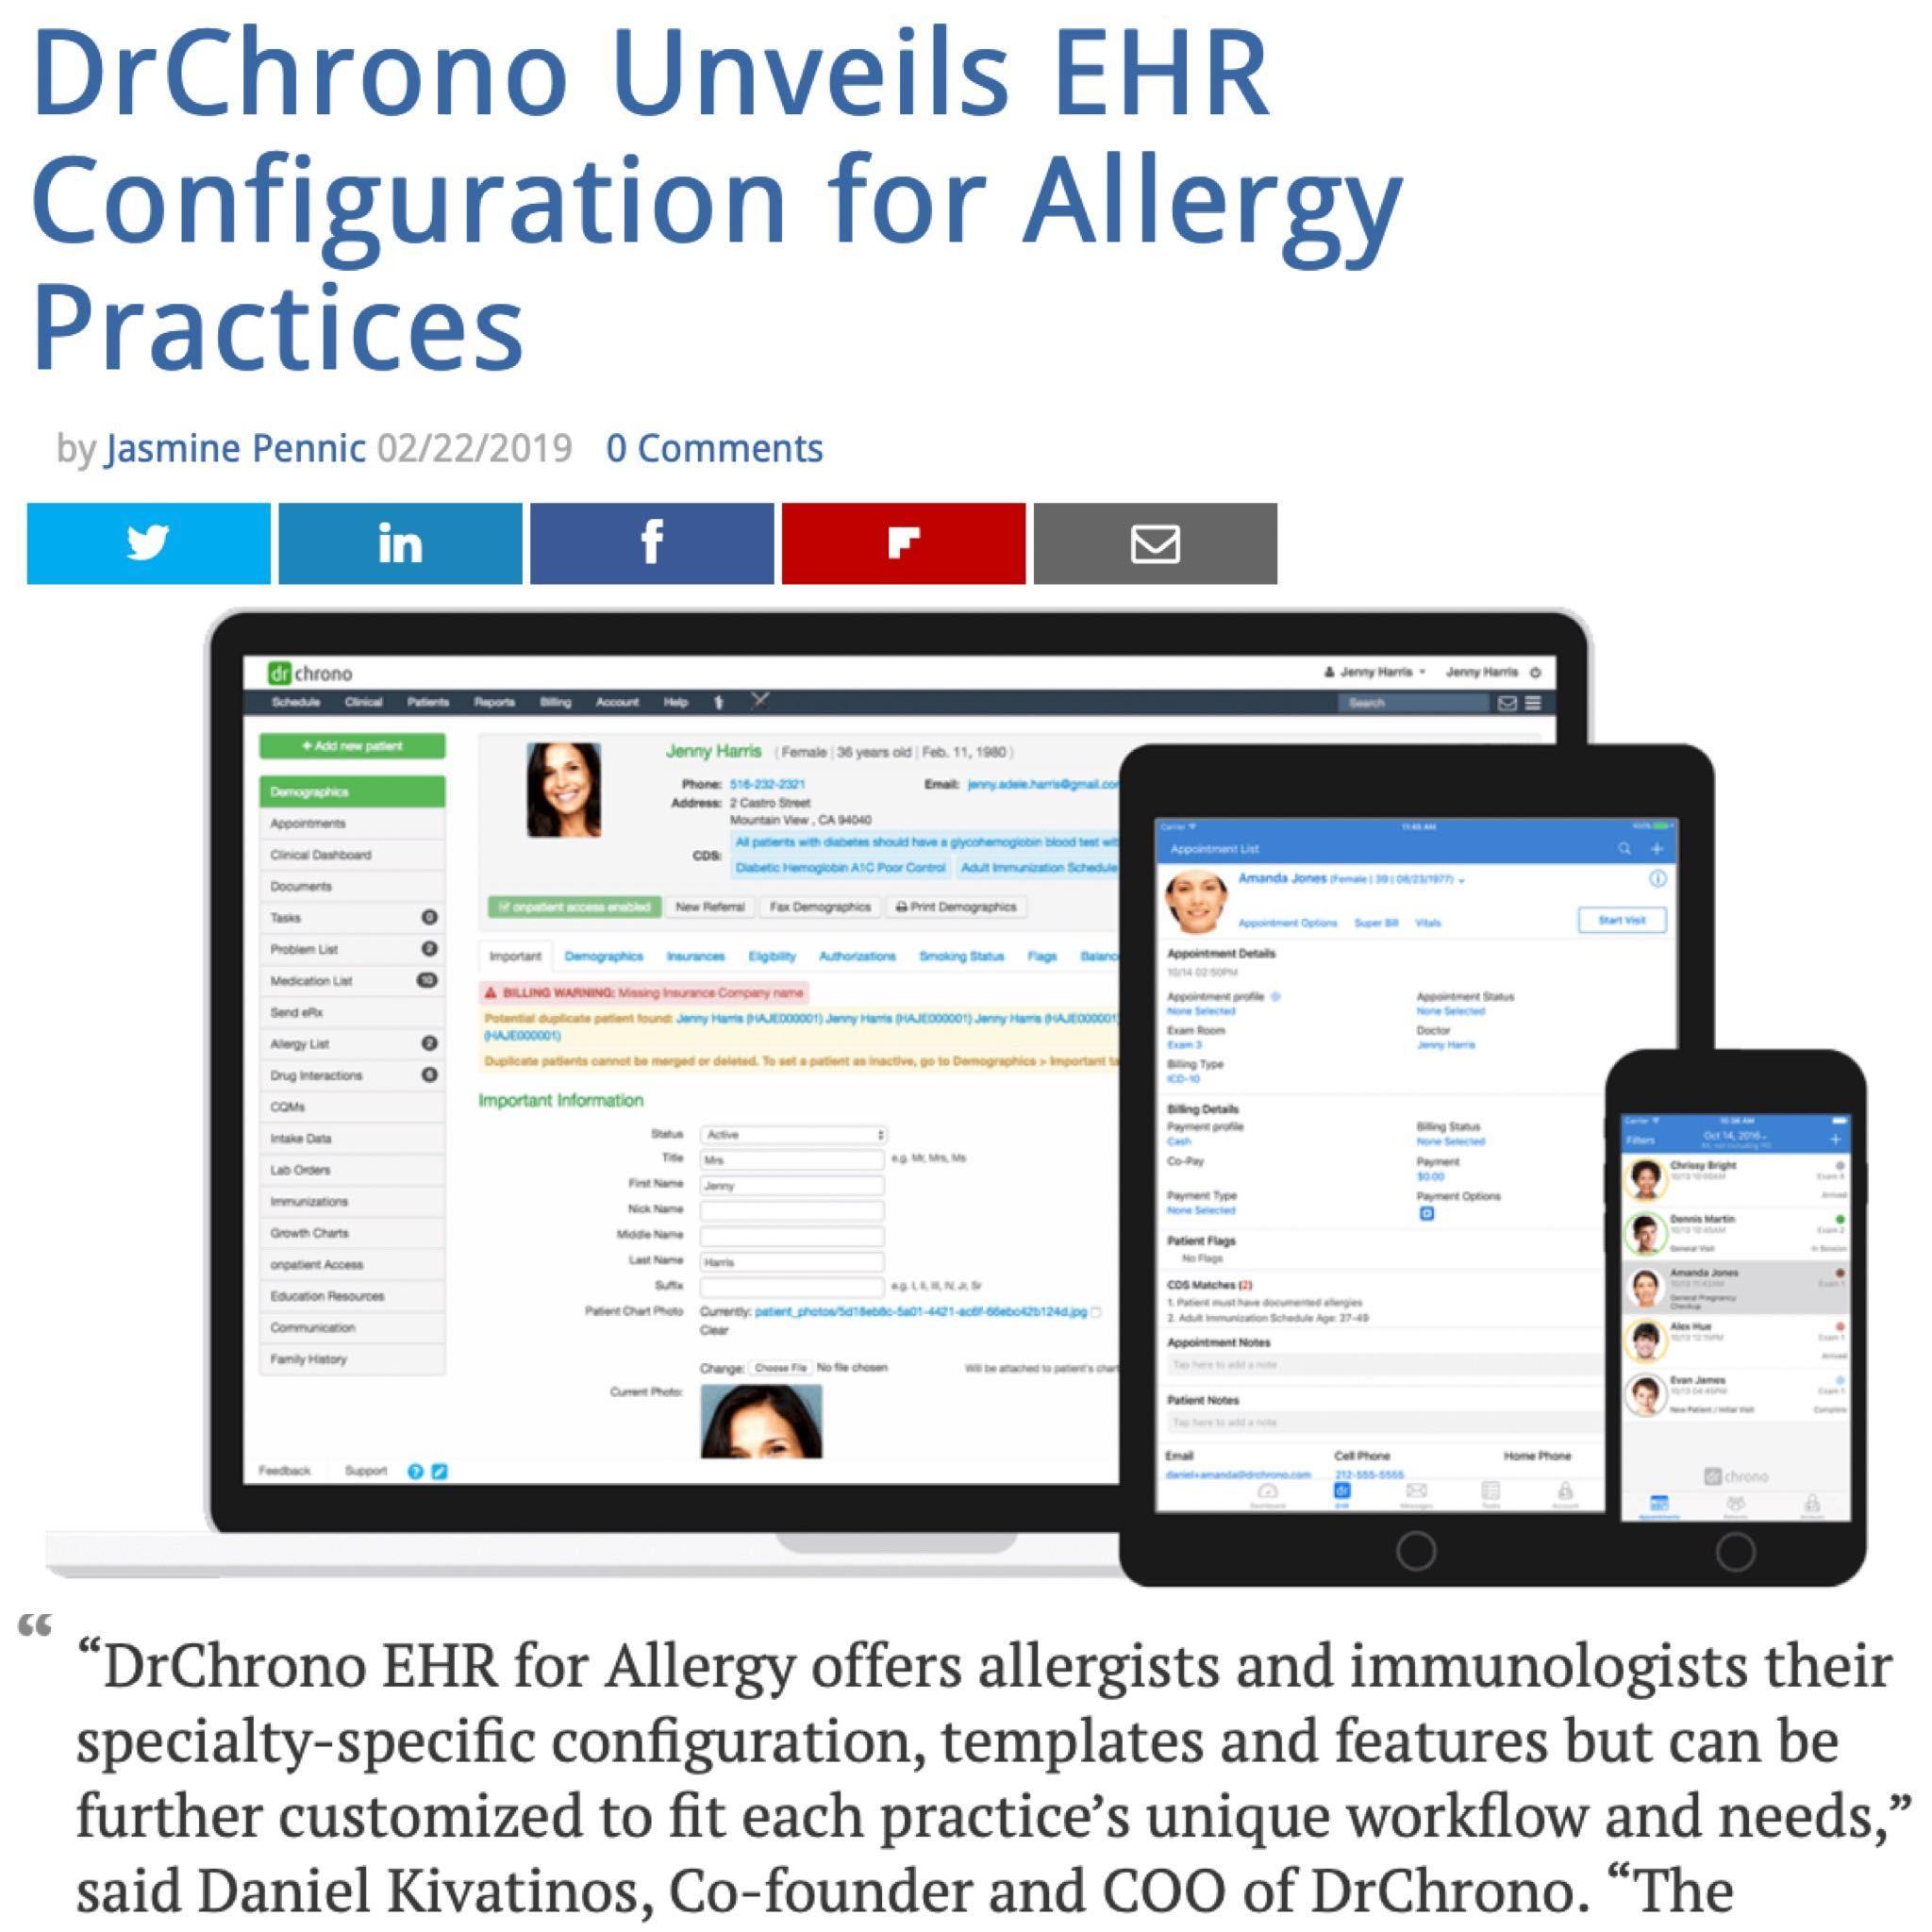 DrChrono Unveils EHR Configuration for Allergy Practices